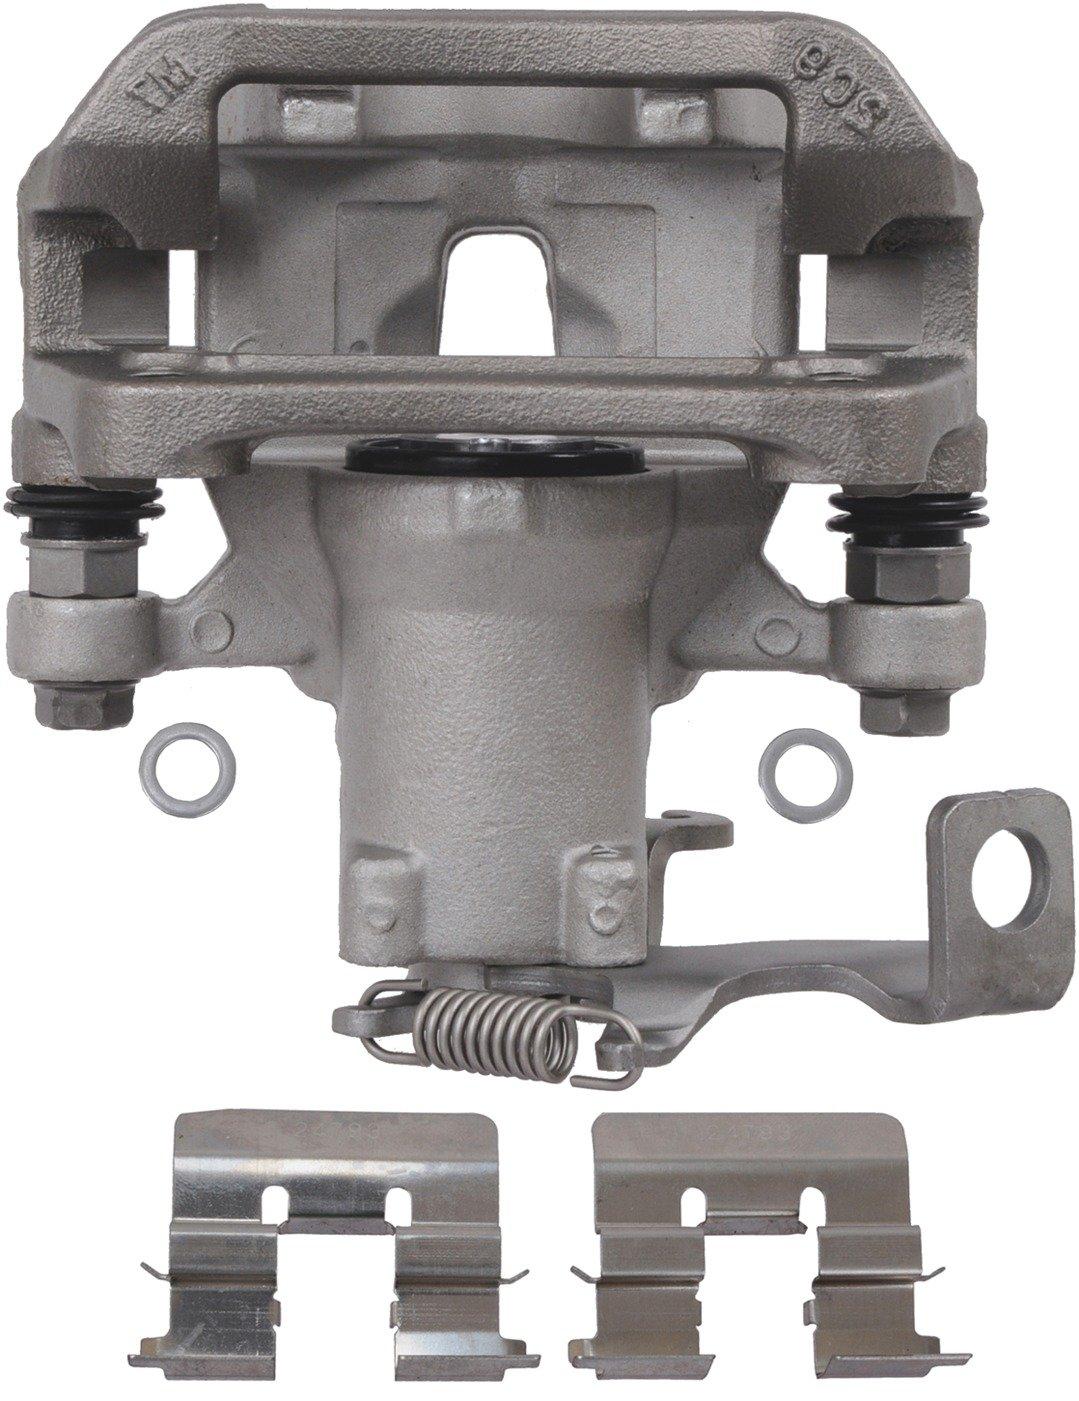 Remanufactured A1 Cardone 19-B6789 Unloaded Brake Caliper with Bracket